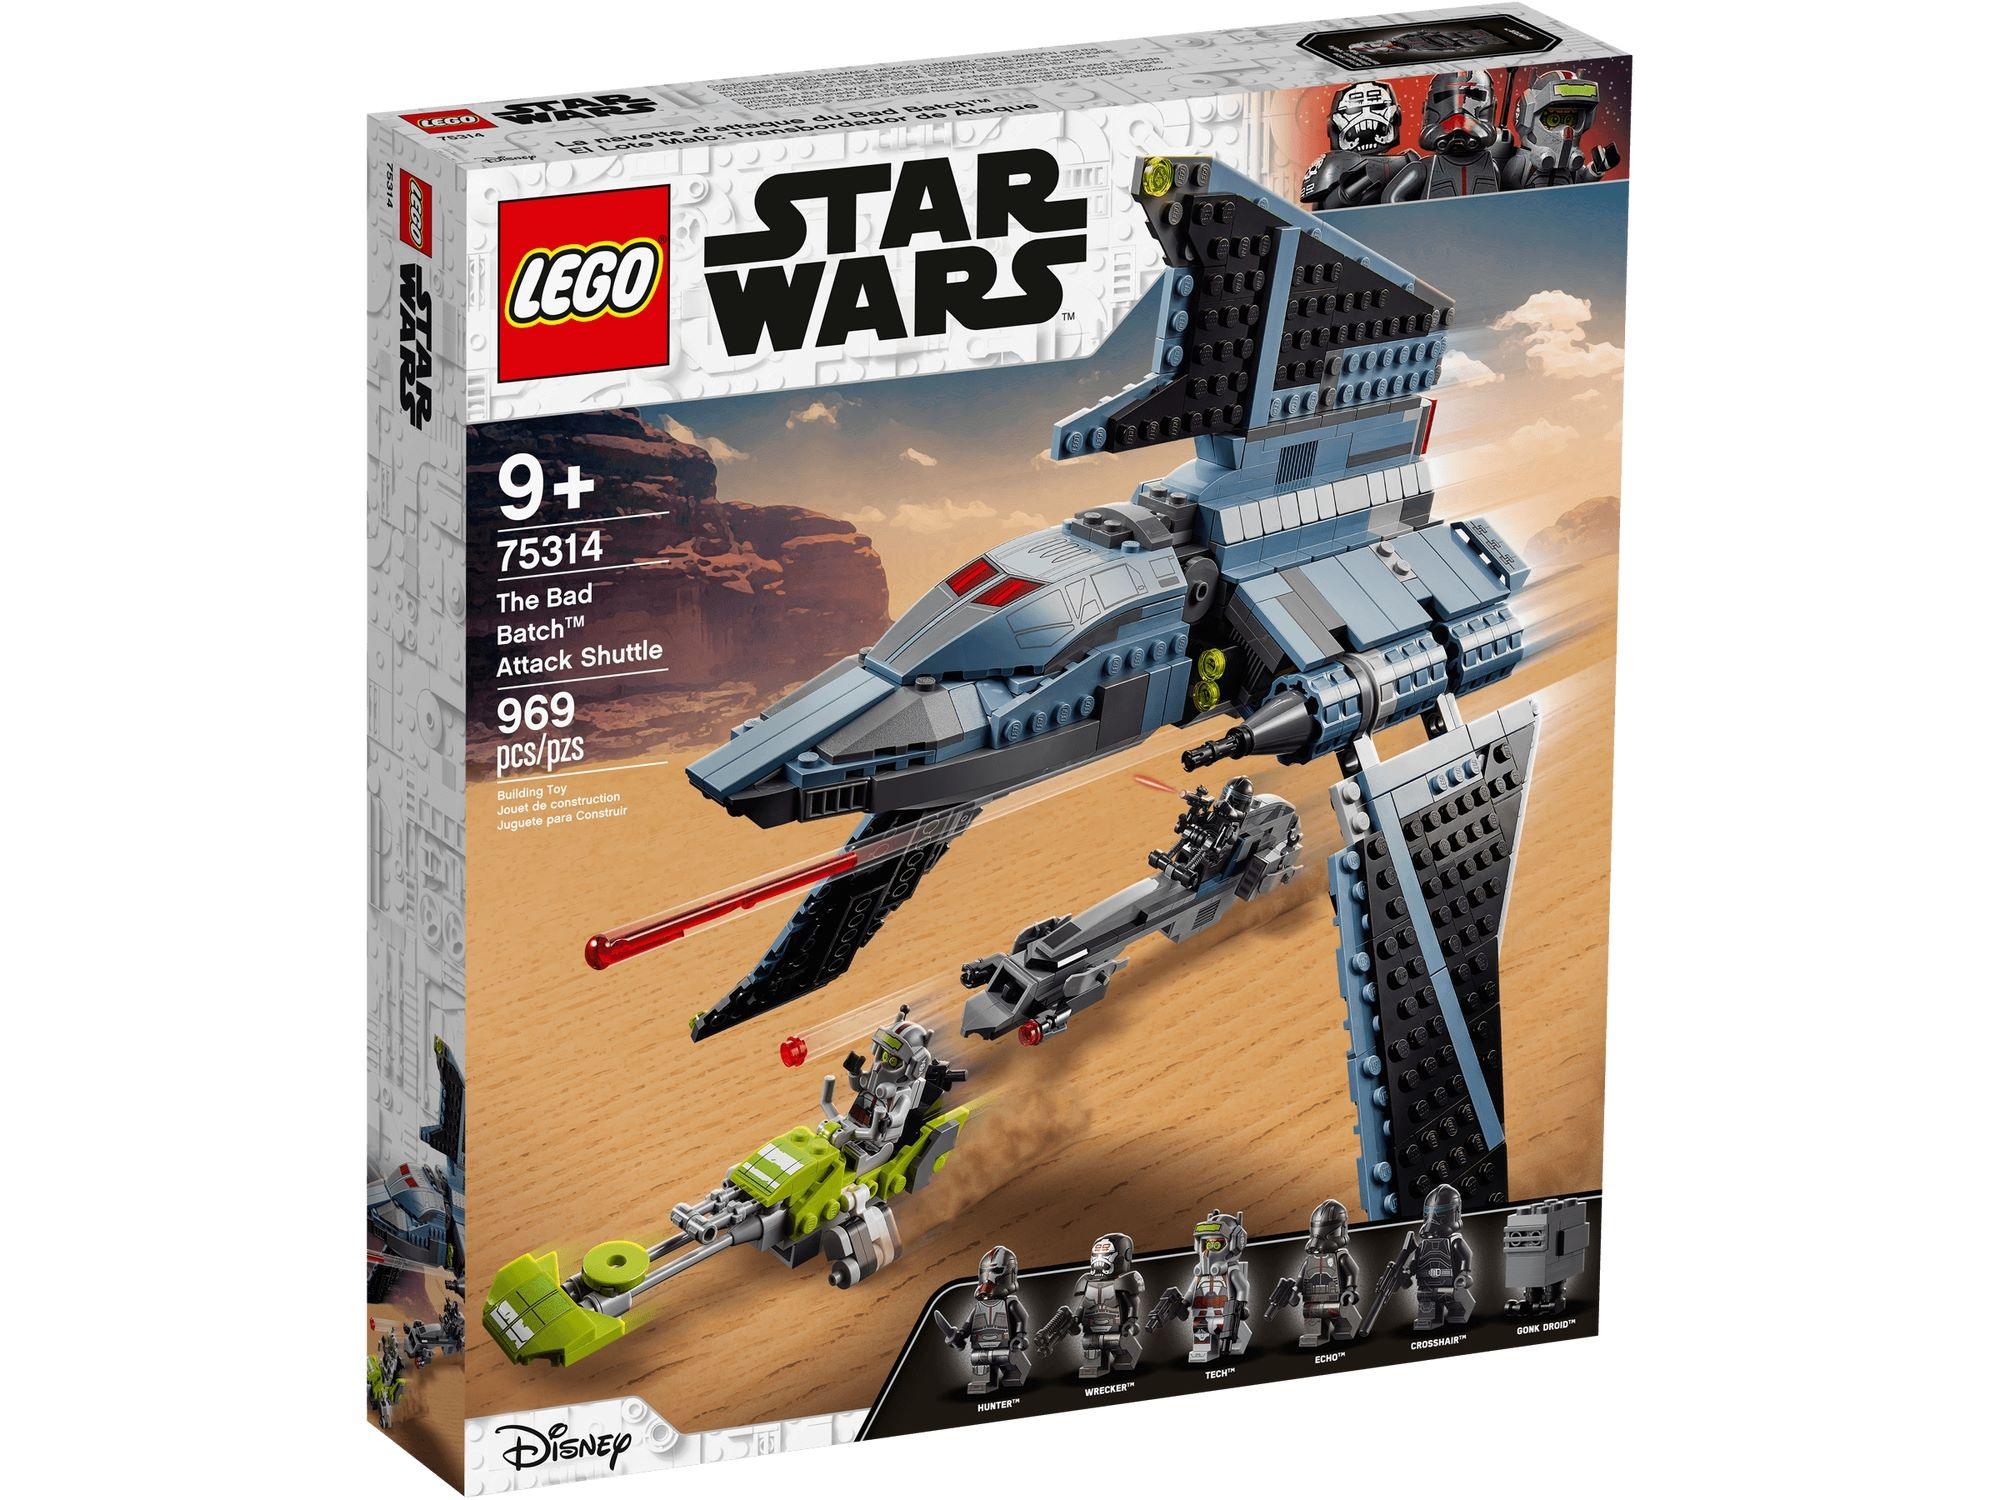 LEGO Star Wars 75314 Angriffsshuttle Aus The Bad Batch 2